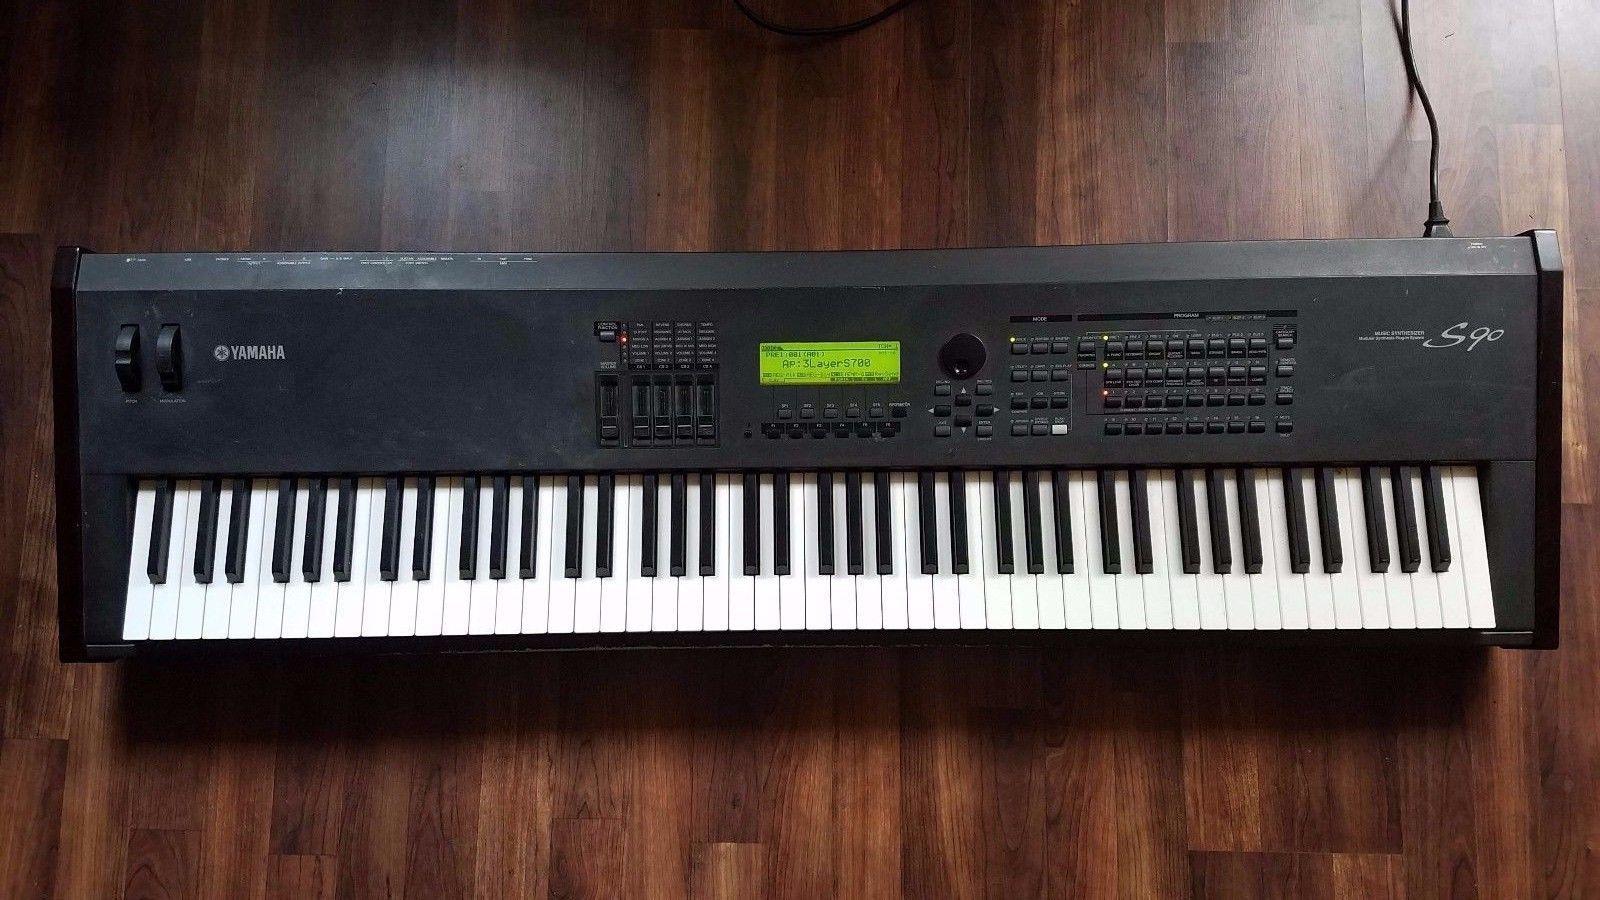 Yamaha S90 (with new keybed) | Yamaha, News, Piano